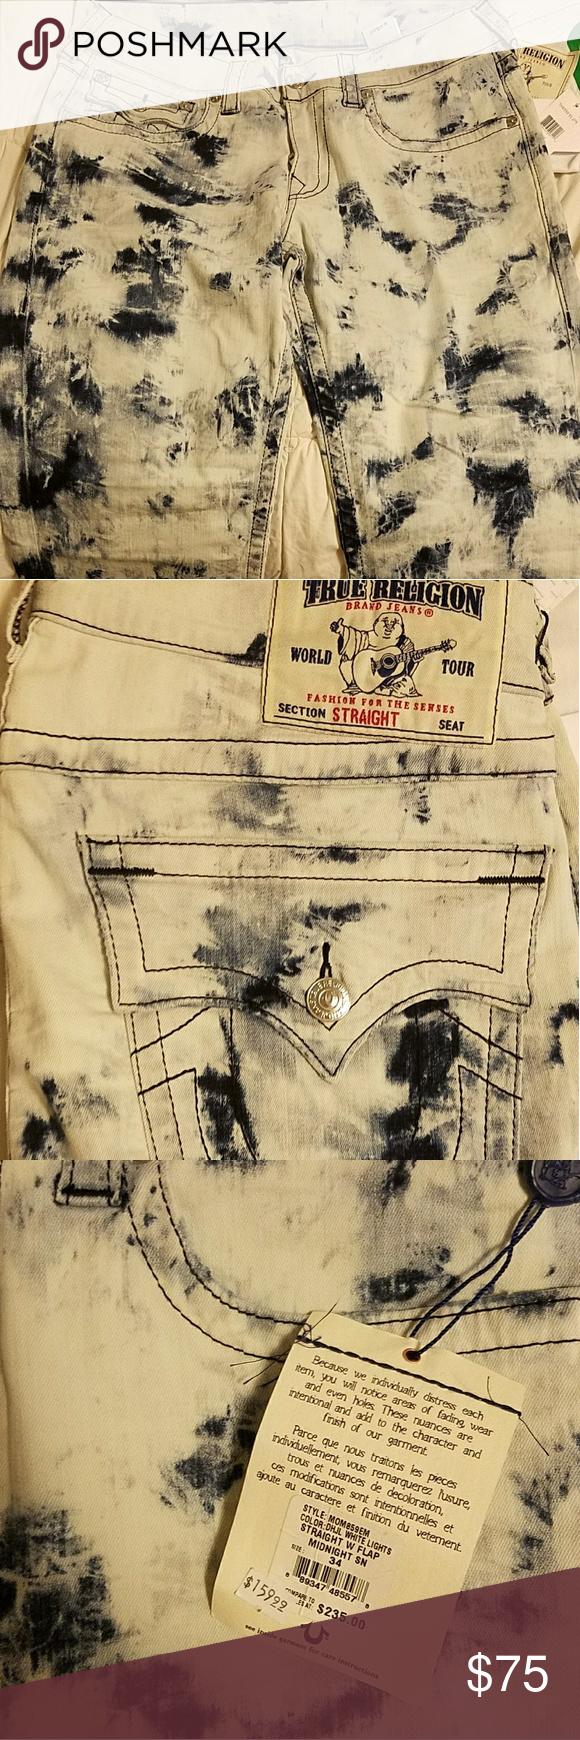 Brand new men's true religion jeans size 34 New with tags full length men's true religion denim True Religion Jeans Relaxed